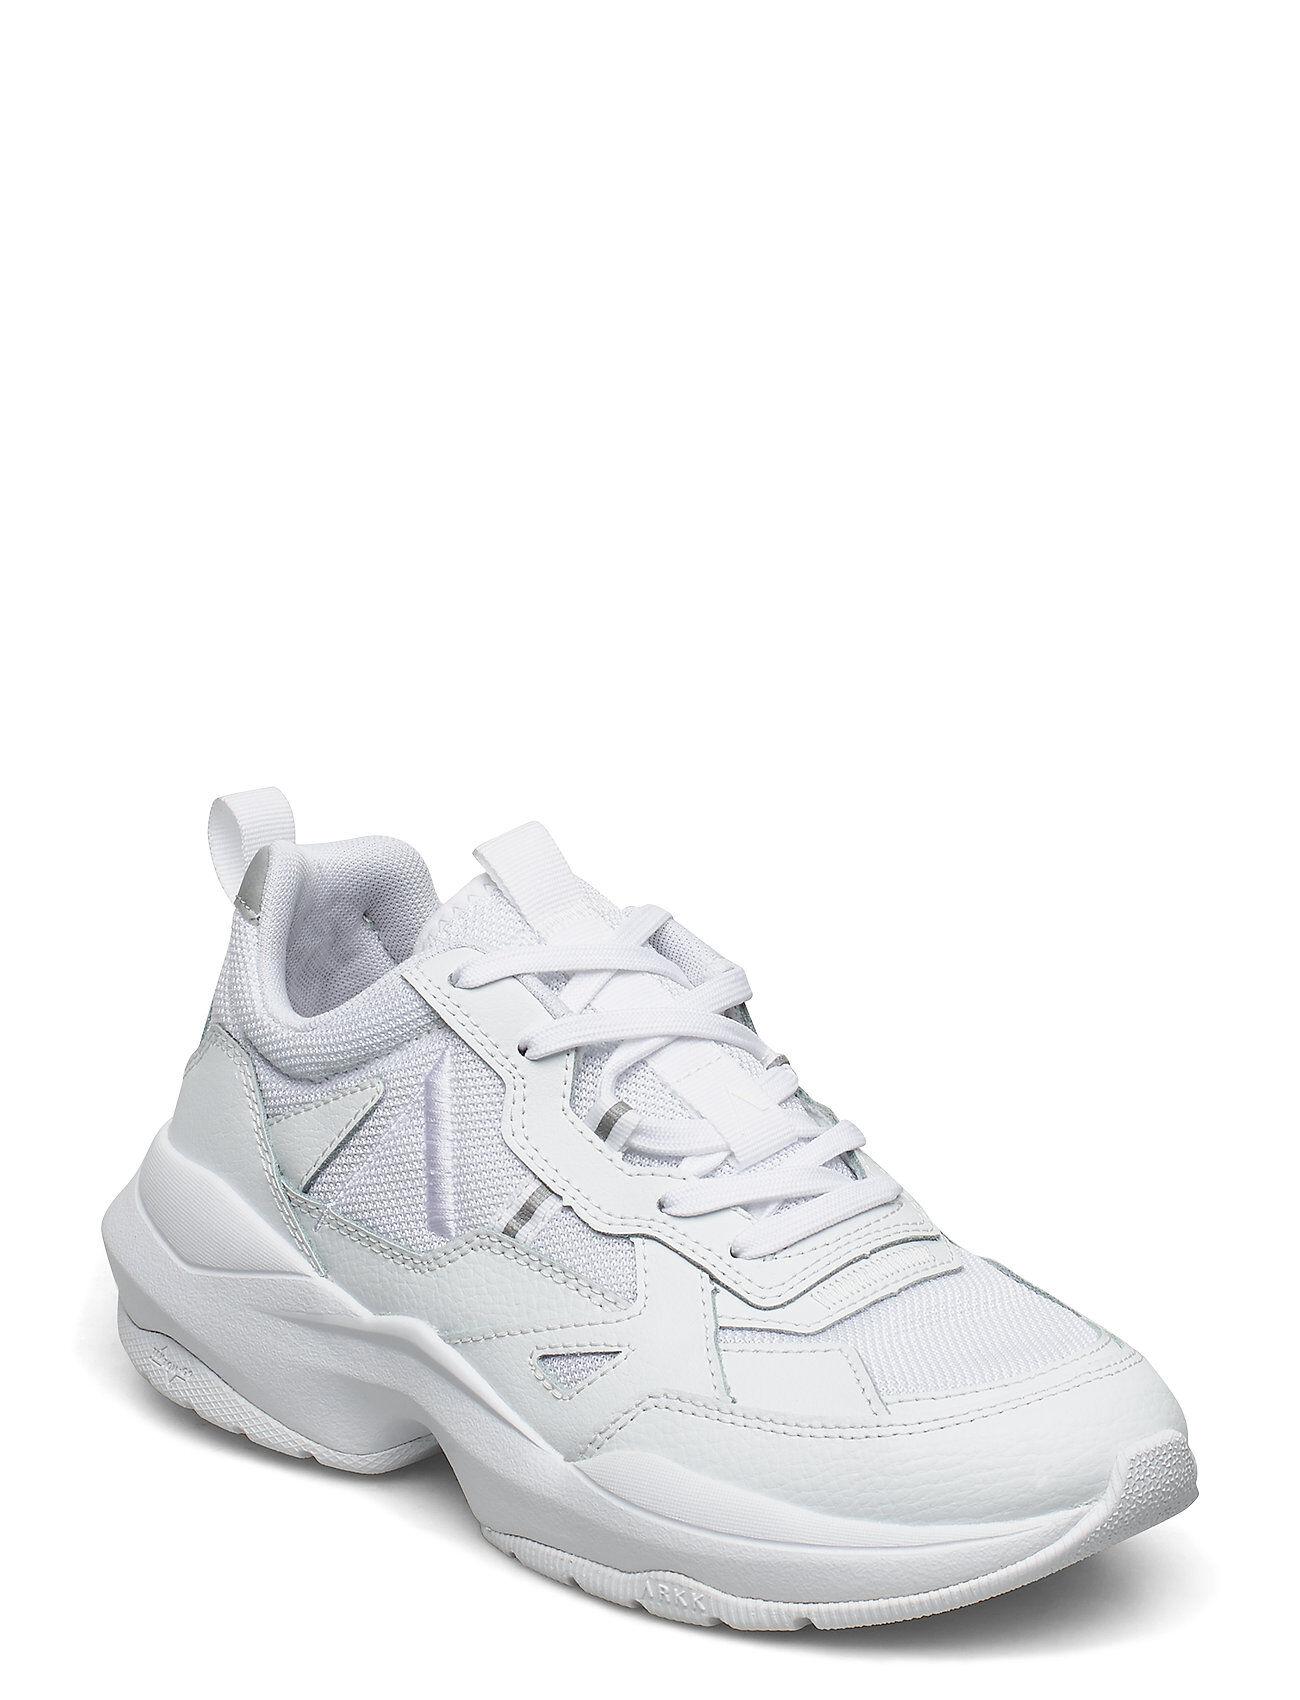 ARKK Copenhagen Quantm Leather T-G9 Triple White - Matalavartiset Sneakerit Tennarit Valkoinen ARKK Copenhagen